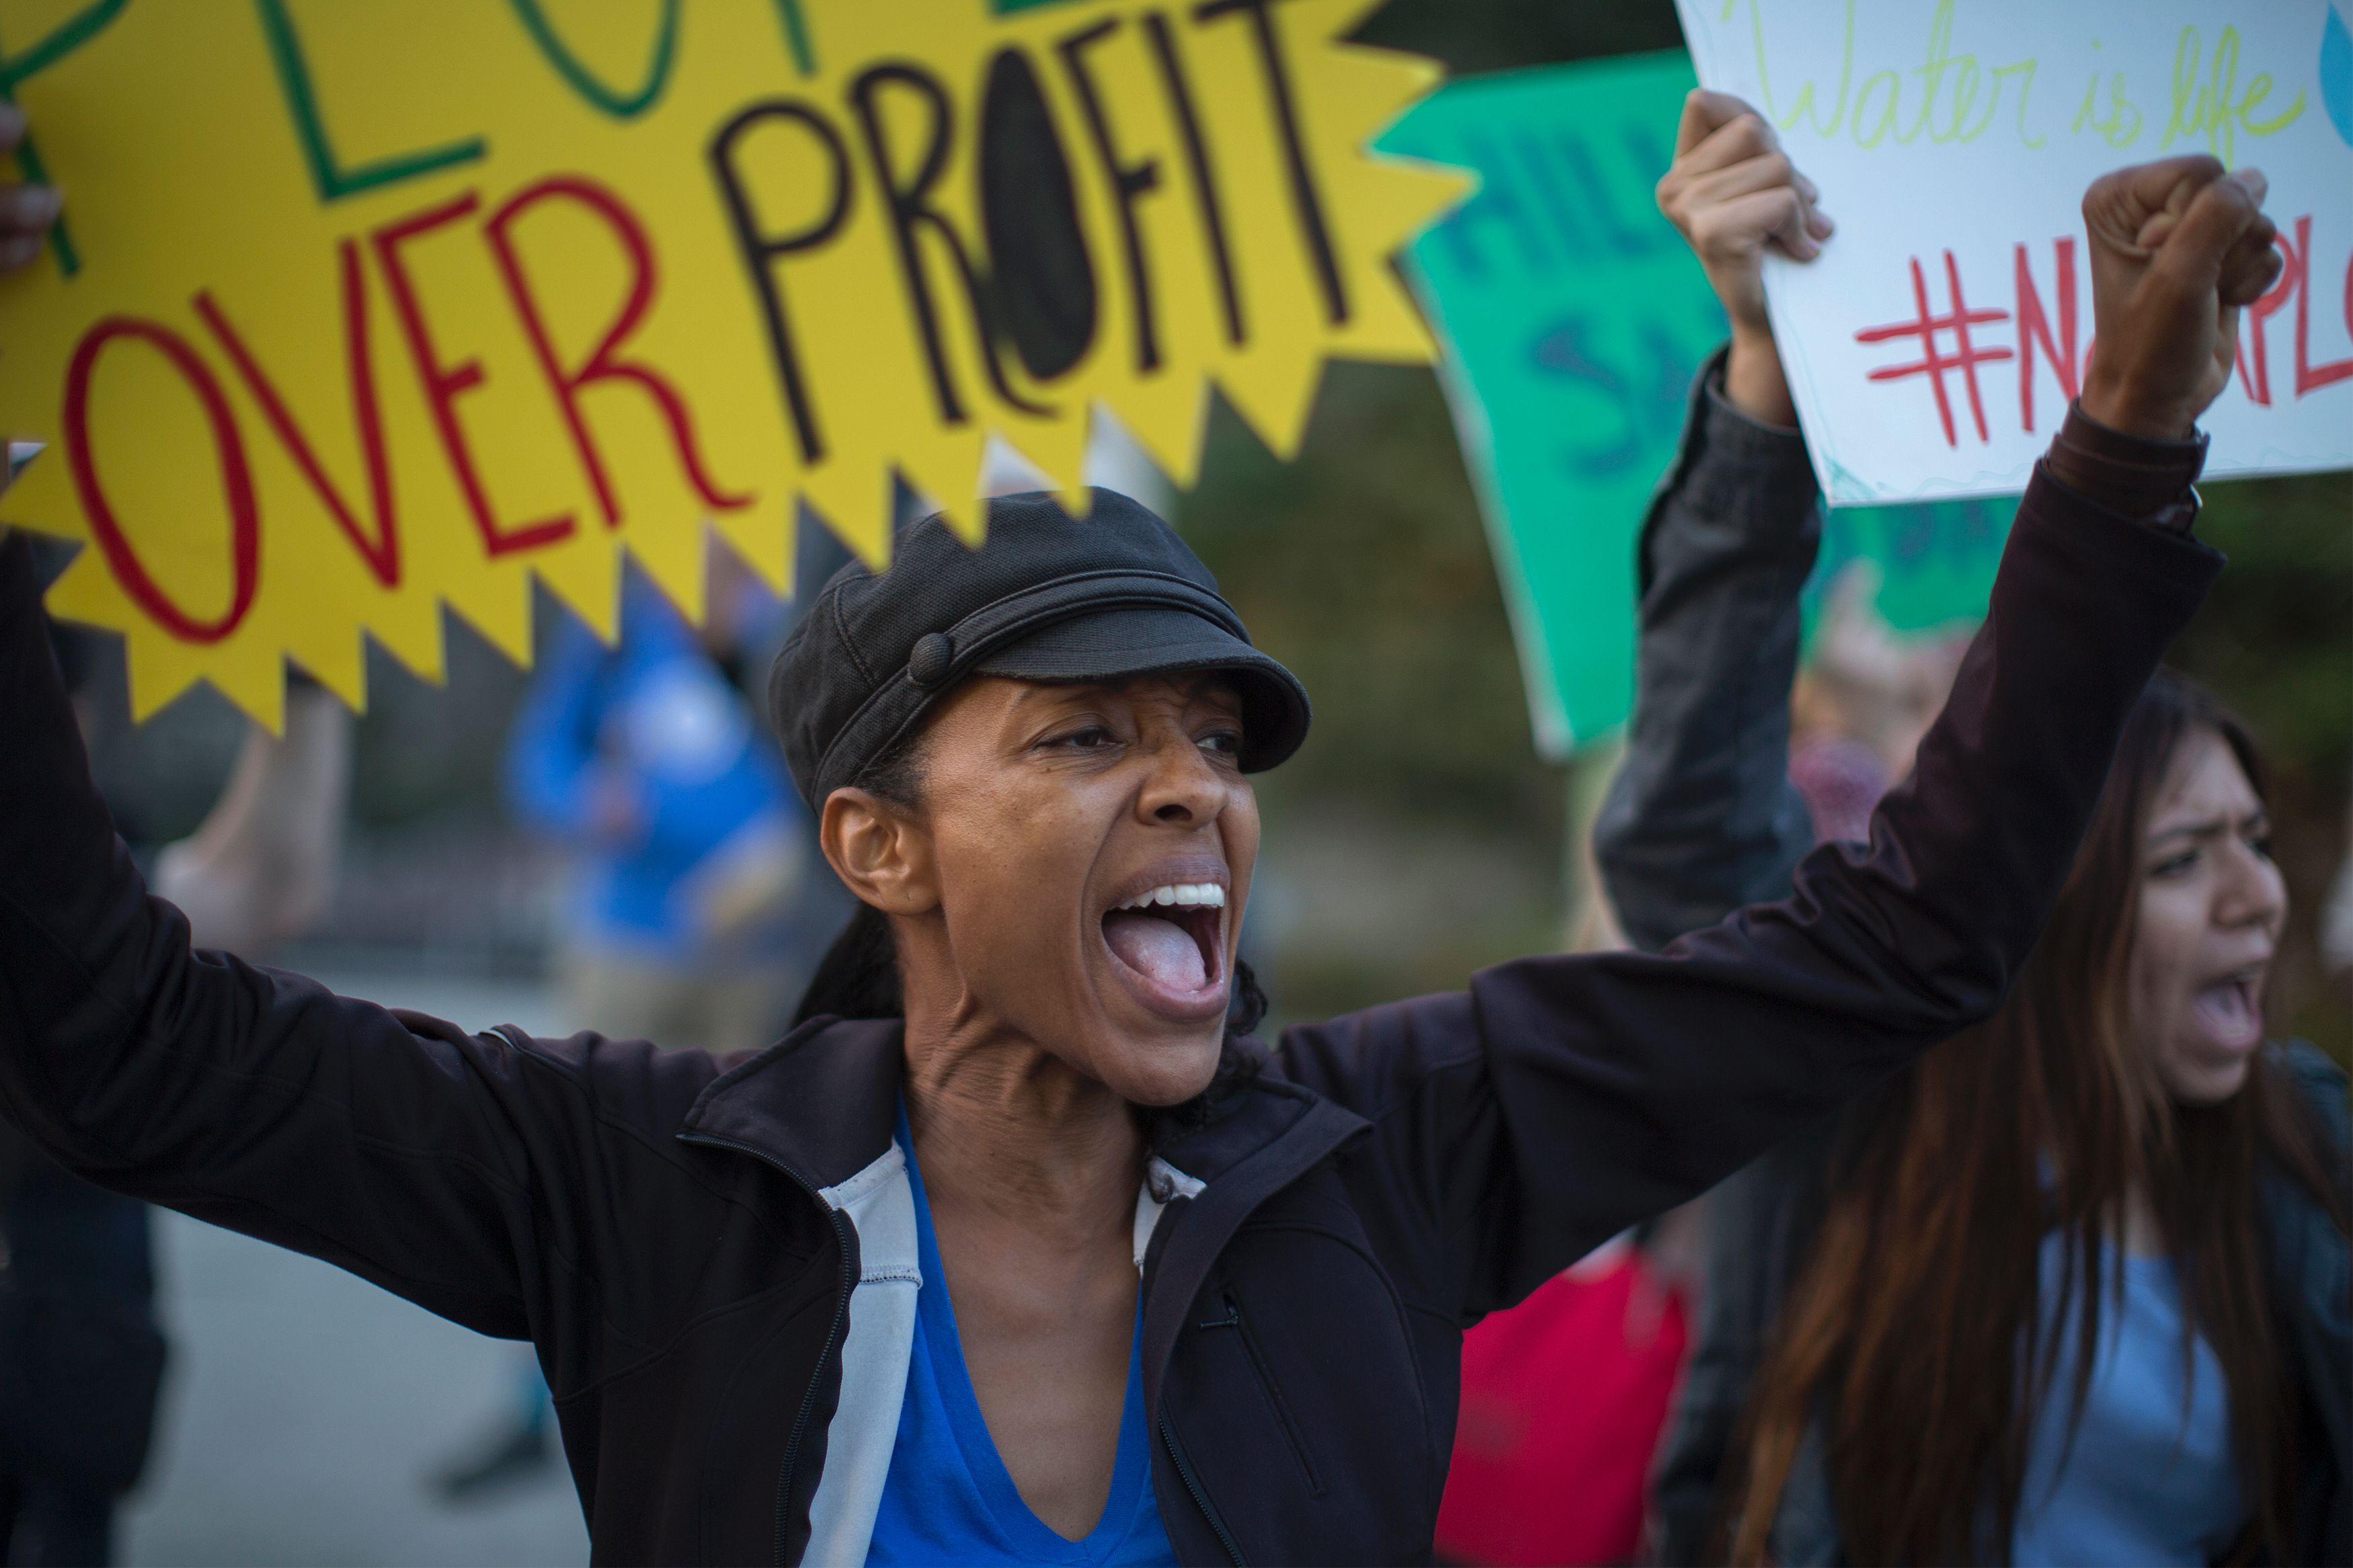 US-POLITICS-ENVIRONMENT-PROTEST